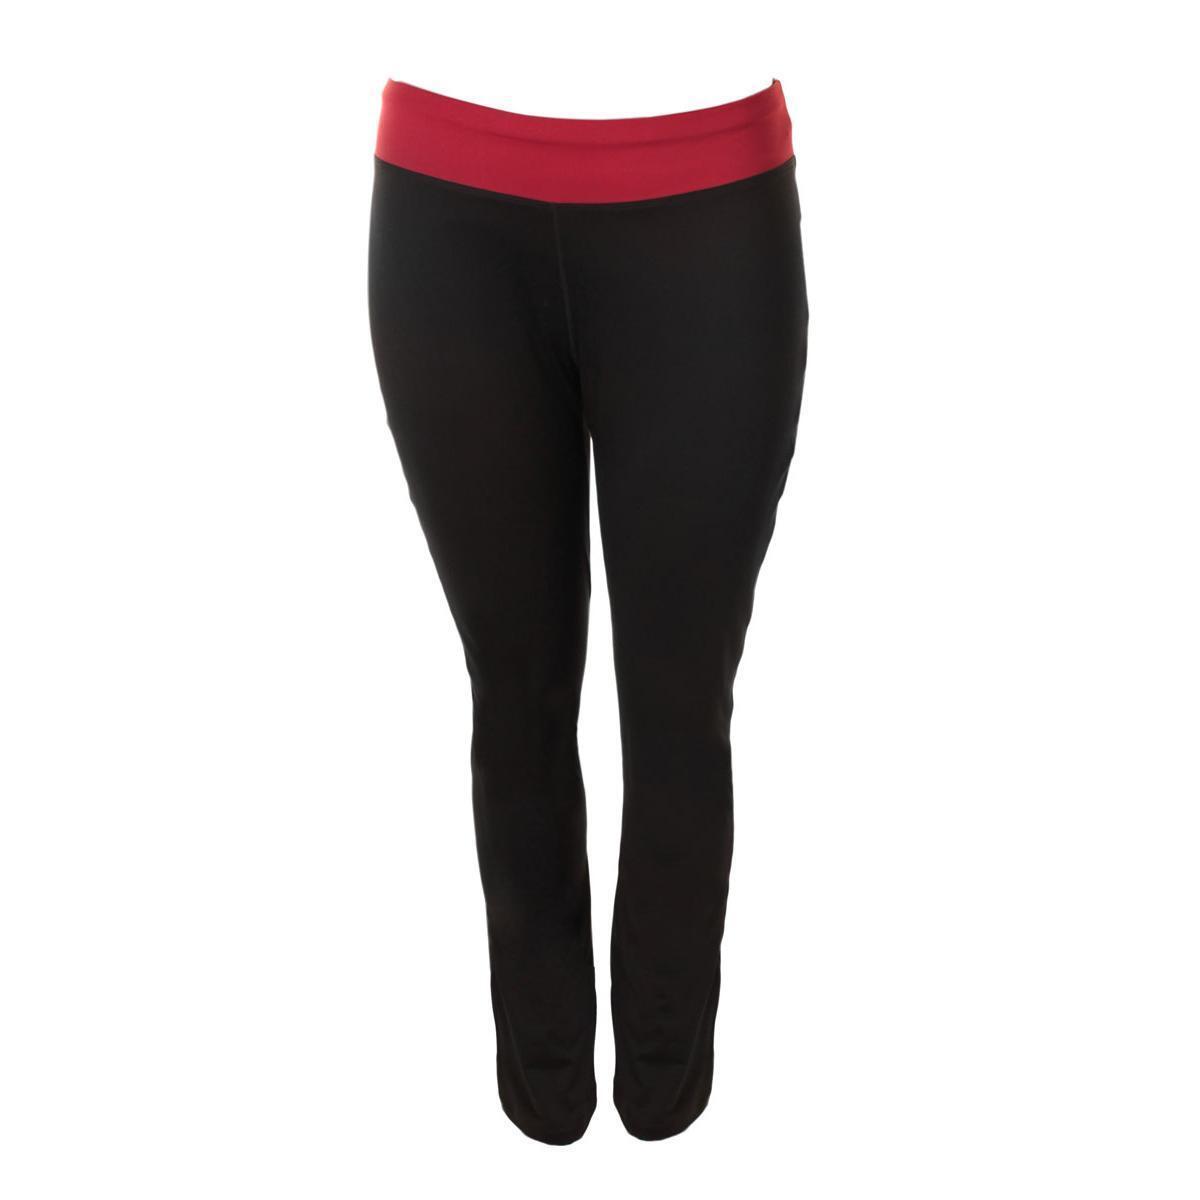 9e0800aab89 Taffy 8225 Womens Black Moisture Wicking Yoga Pants Athletic Plus 2x ...